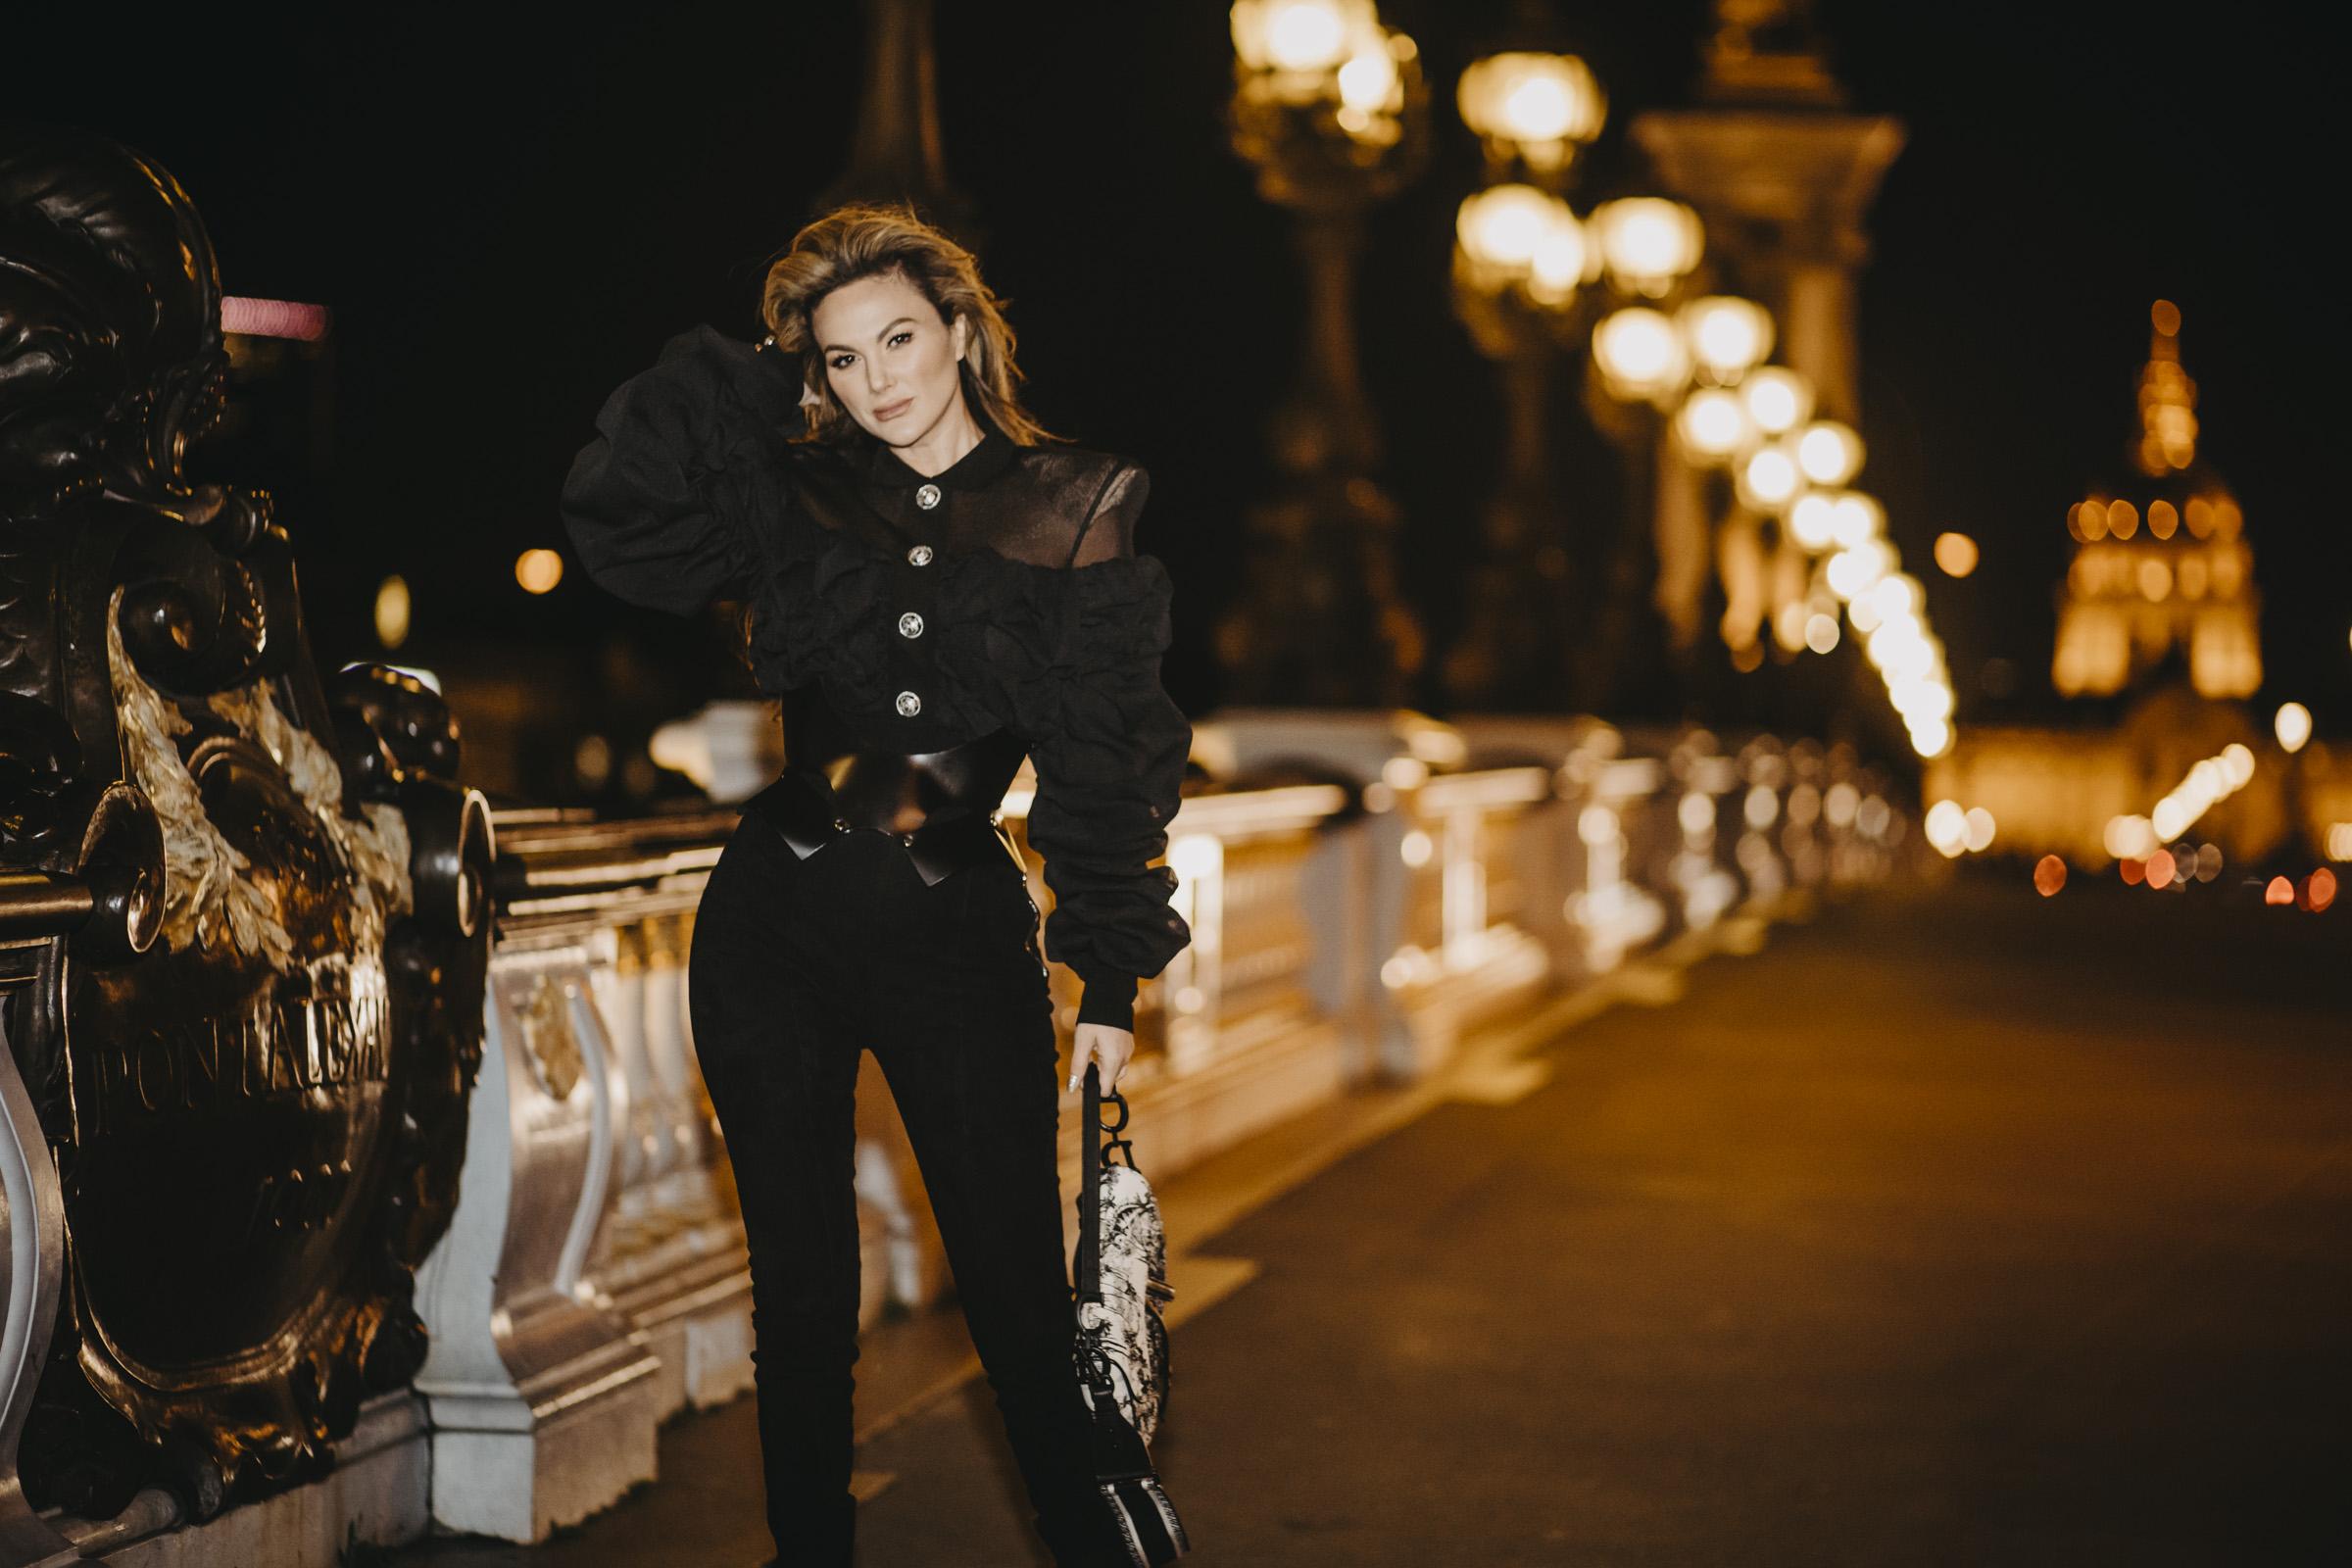 paris fashion photo at night